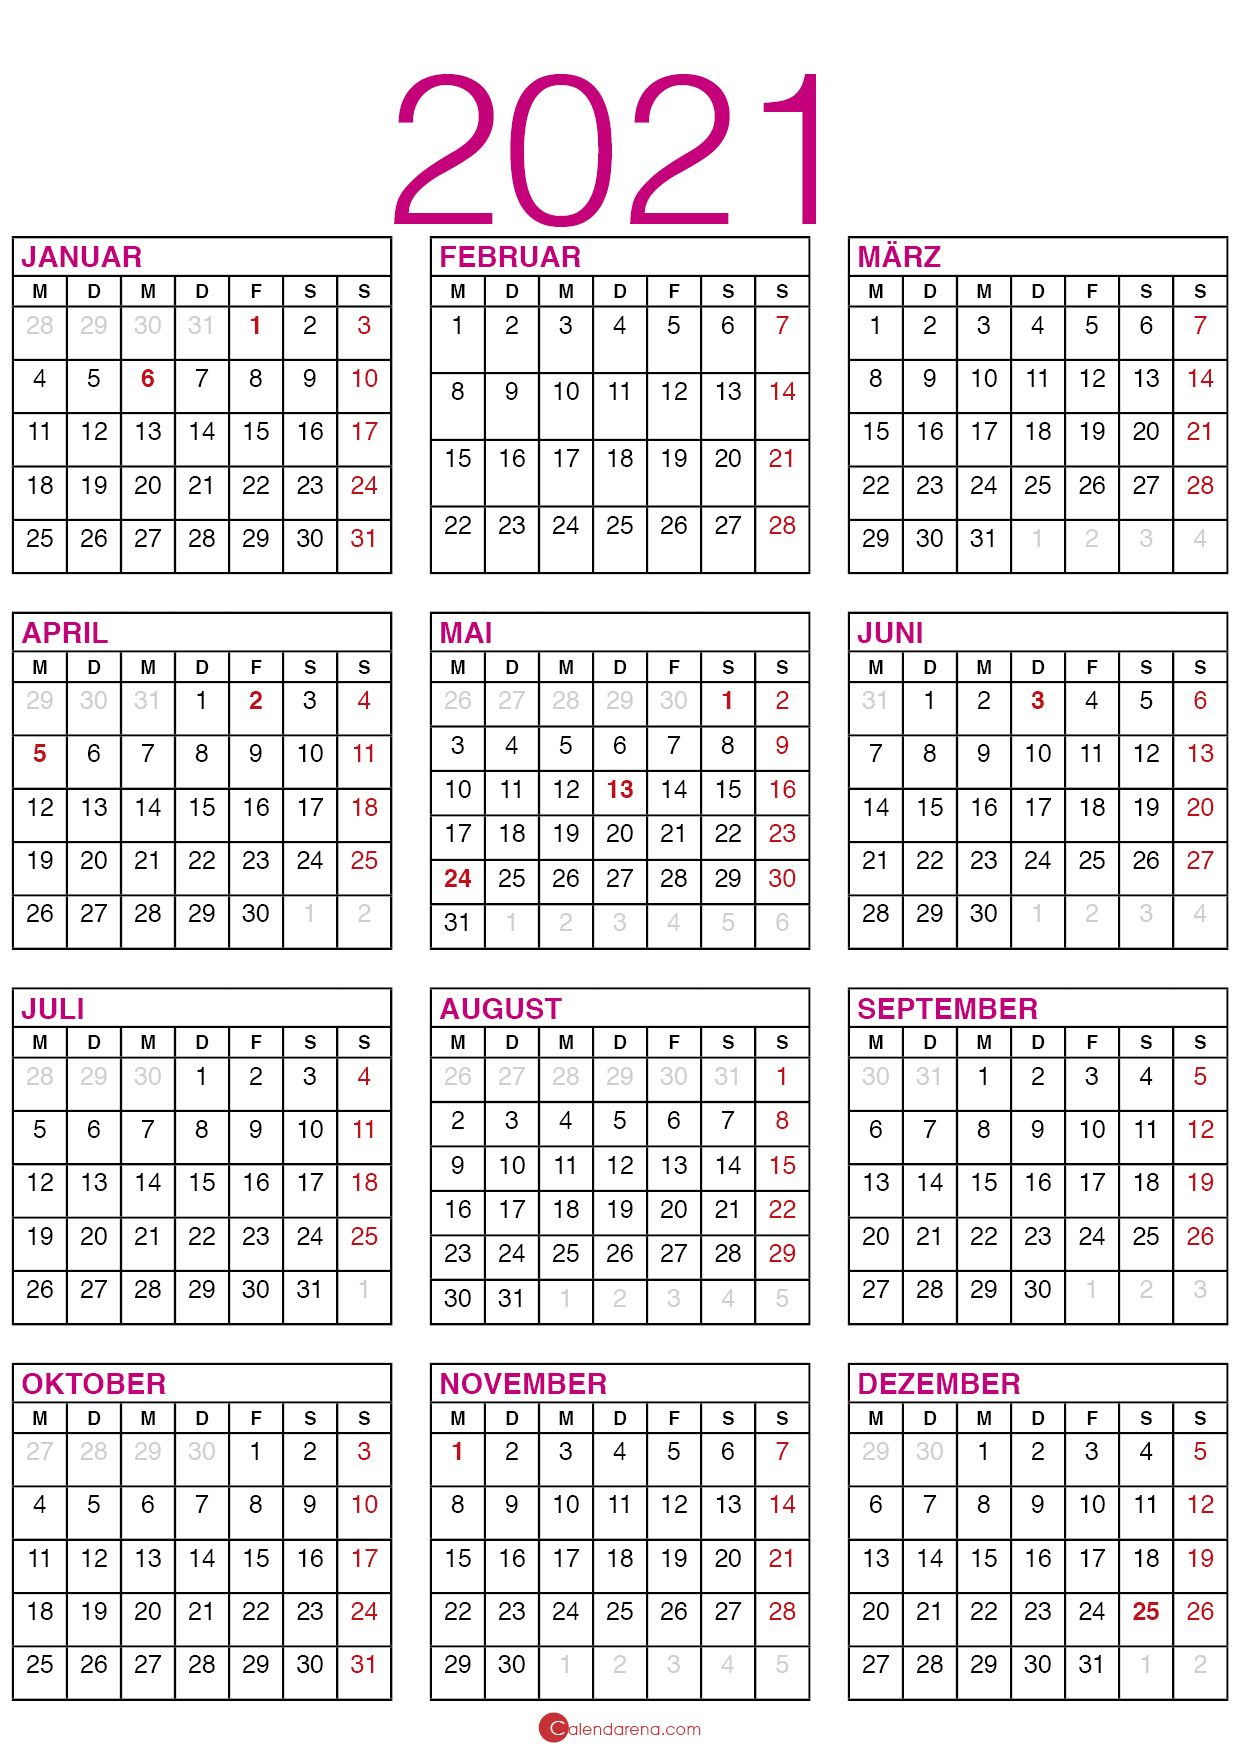 kalender 2021 bayern | Kalender, Kalender erstellen ...